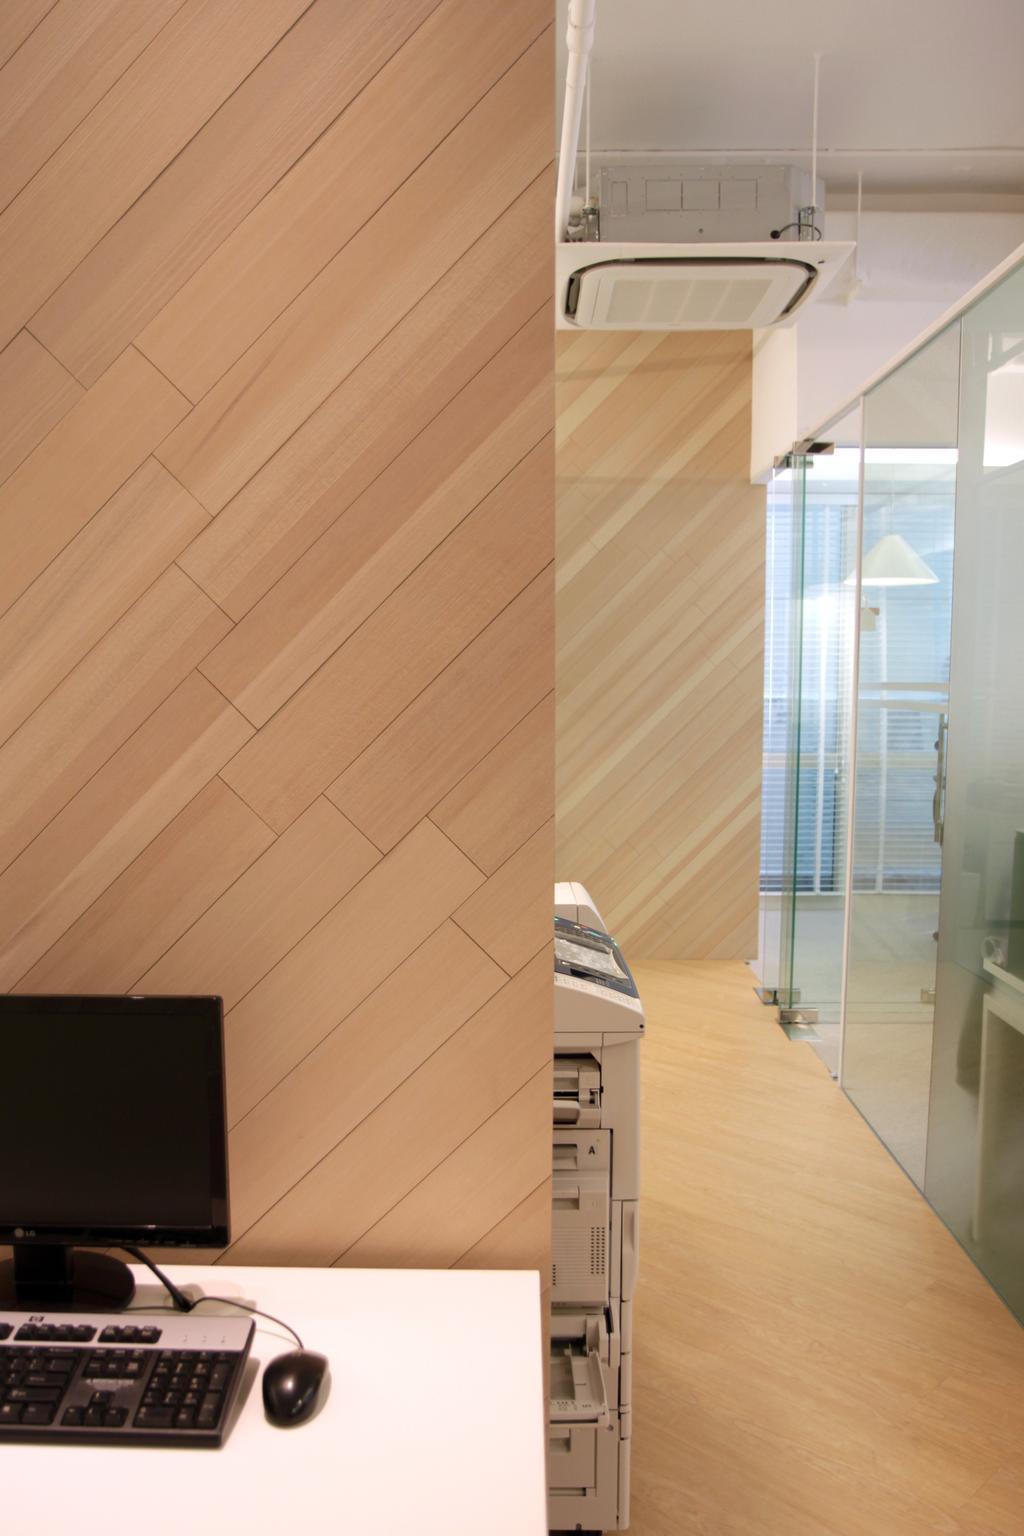 POLWEL Office, Commercial, Architect, EHKA Studio, Modern